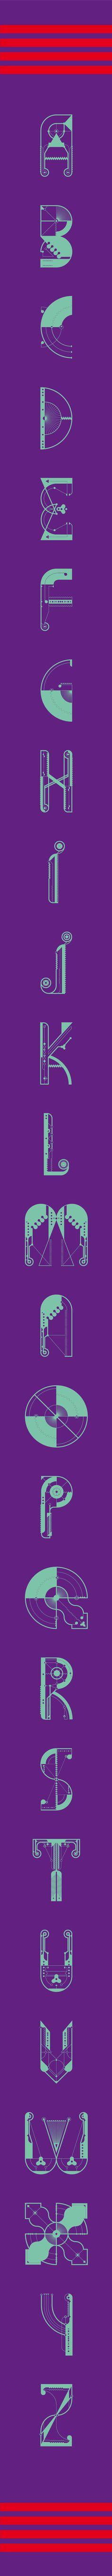 Typography By: Jorrit van Rijt | Square Inch Design Blog